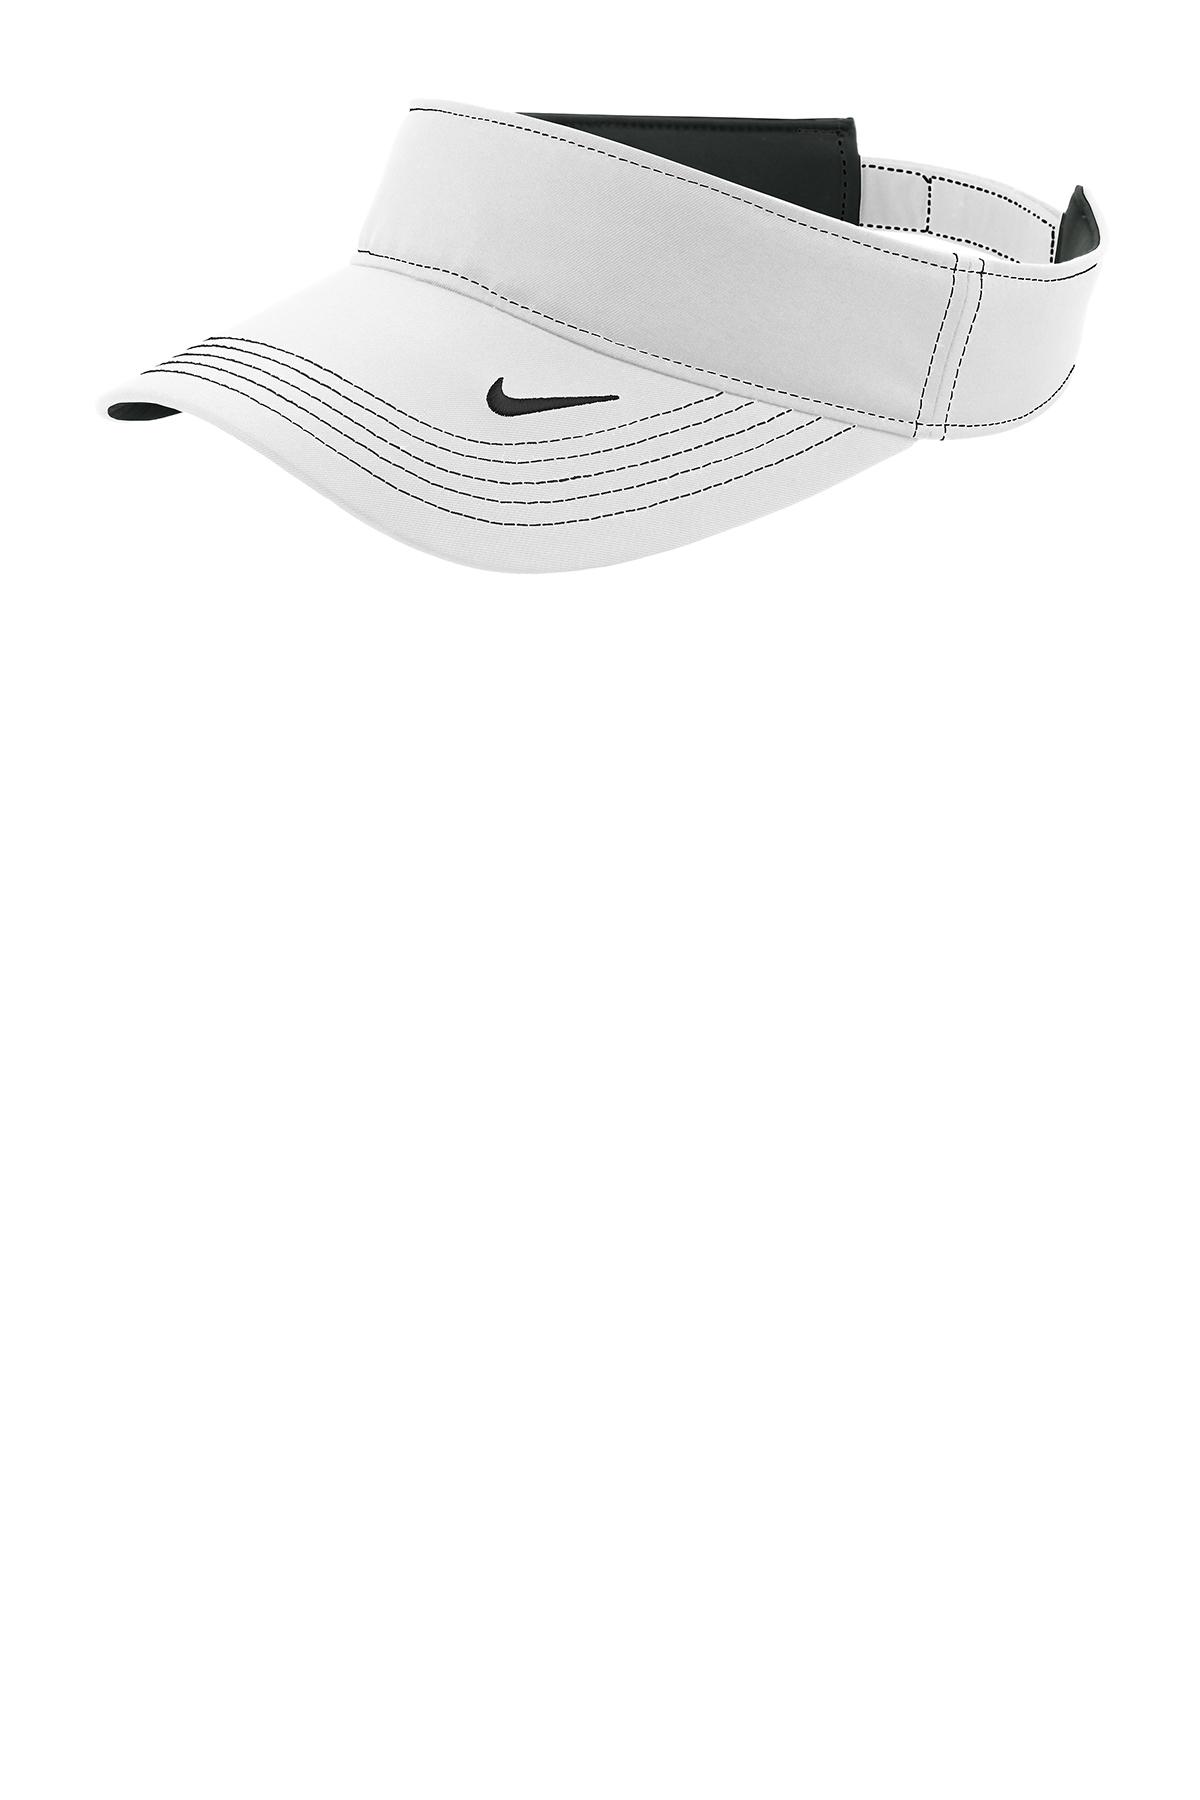 Nike Dri-FIT Swoosh Visor  9ec21d41378